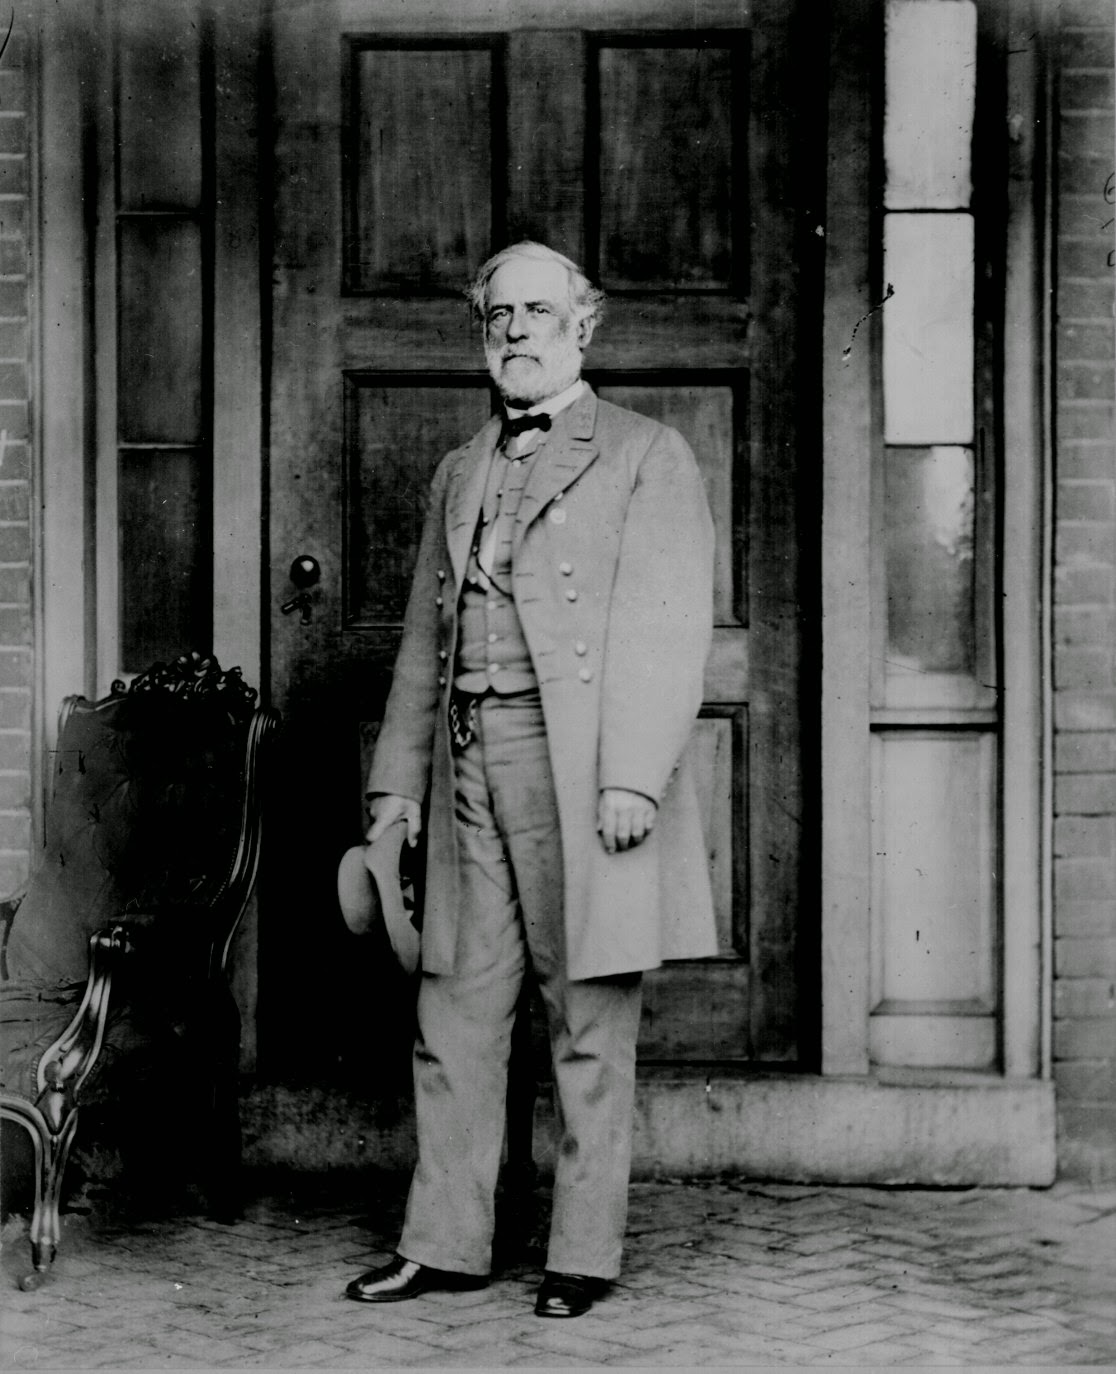 Guerra Civil Estadounidense - General Lee